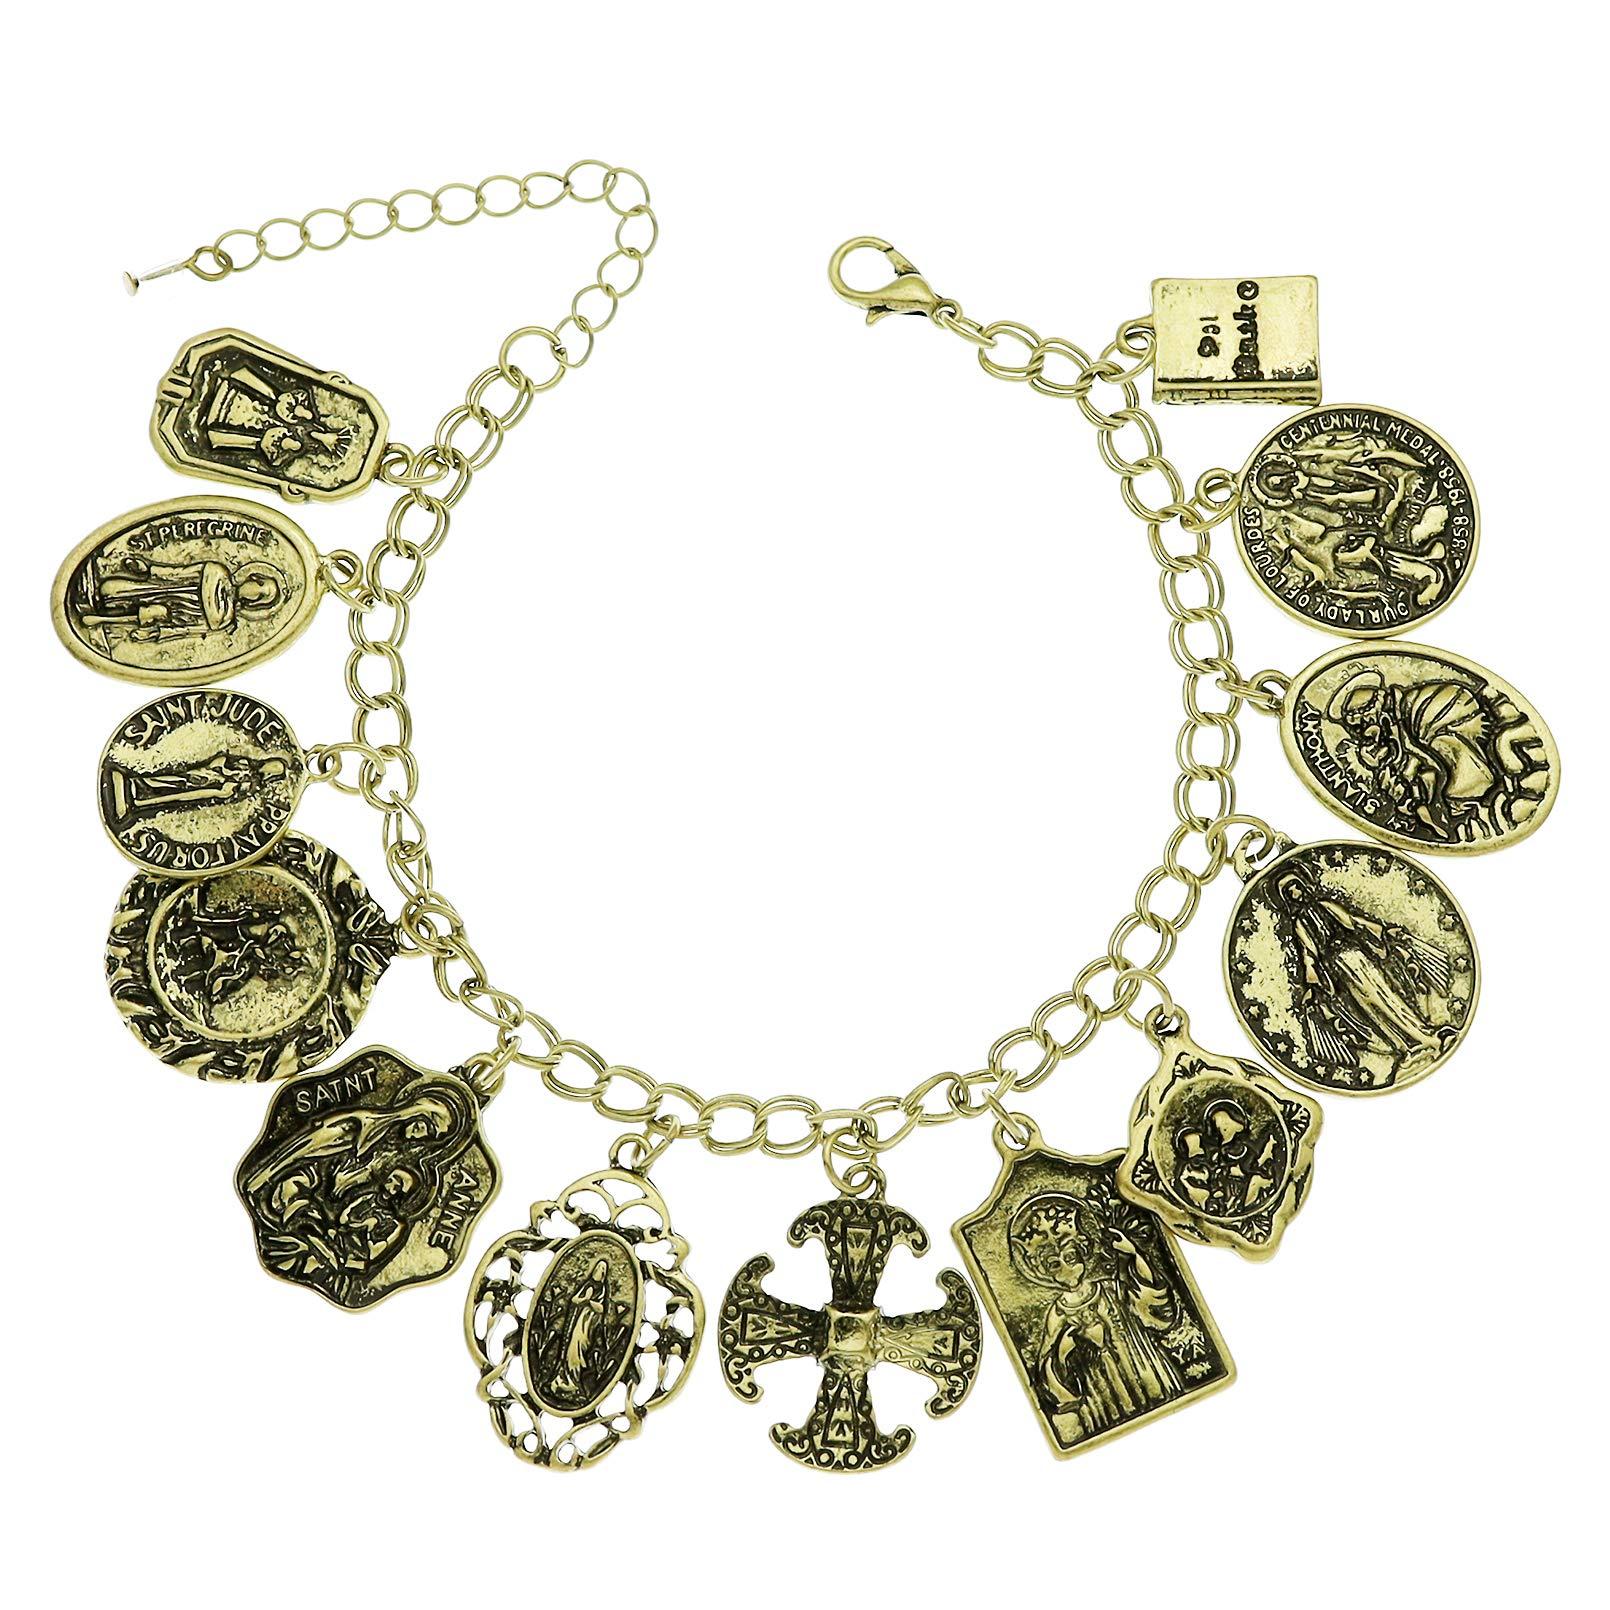 Catholic Religious Church Medals Cross Chain Cuff Bracelet Bangle Charm Inspirational Bible Jesus Saints Pray for US